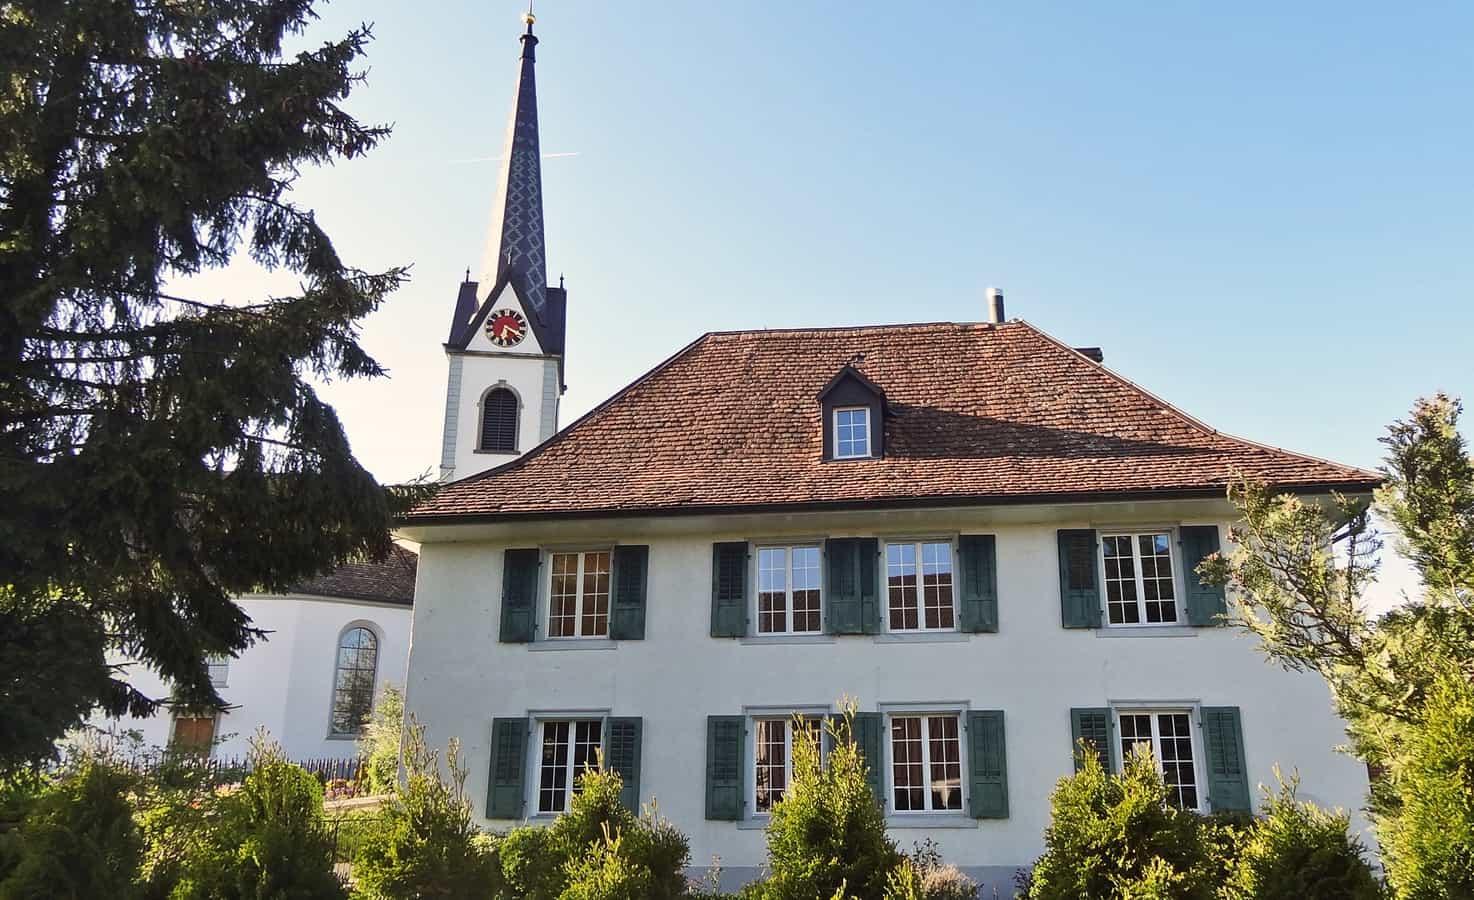 Reformierte Kirche Langrickenbach mit ehemaligem Pfarrhaus